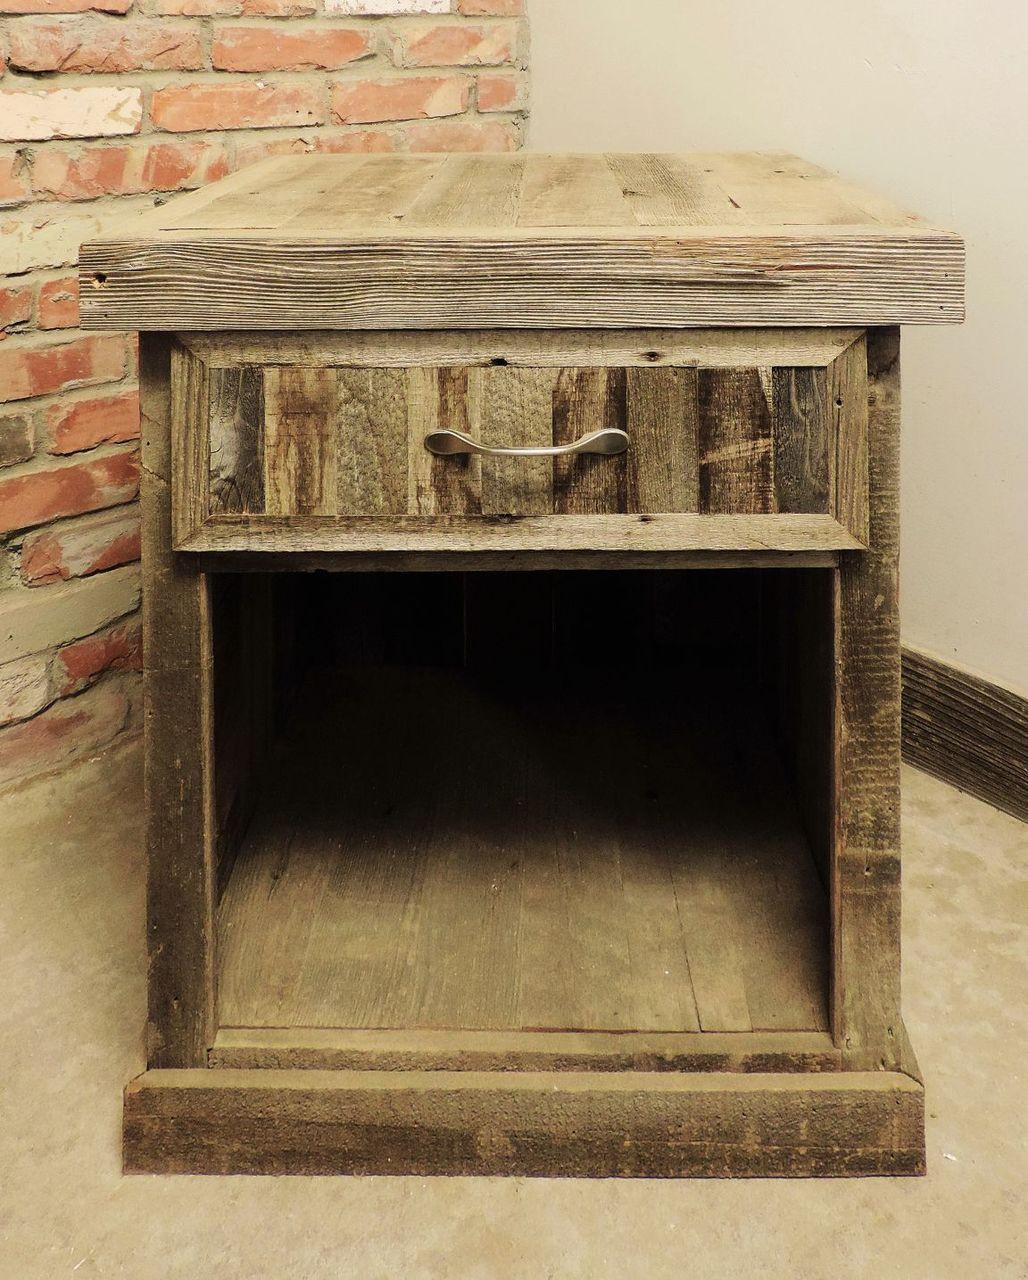 Reclaimed Wood Nightstand Handmade In The Usa Ships Free